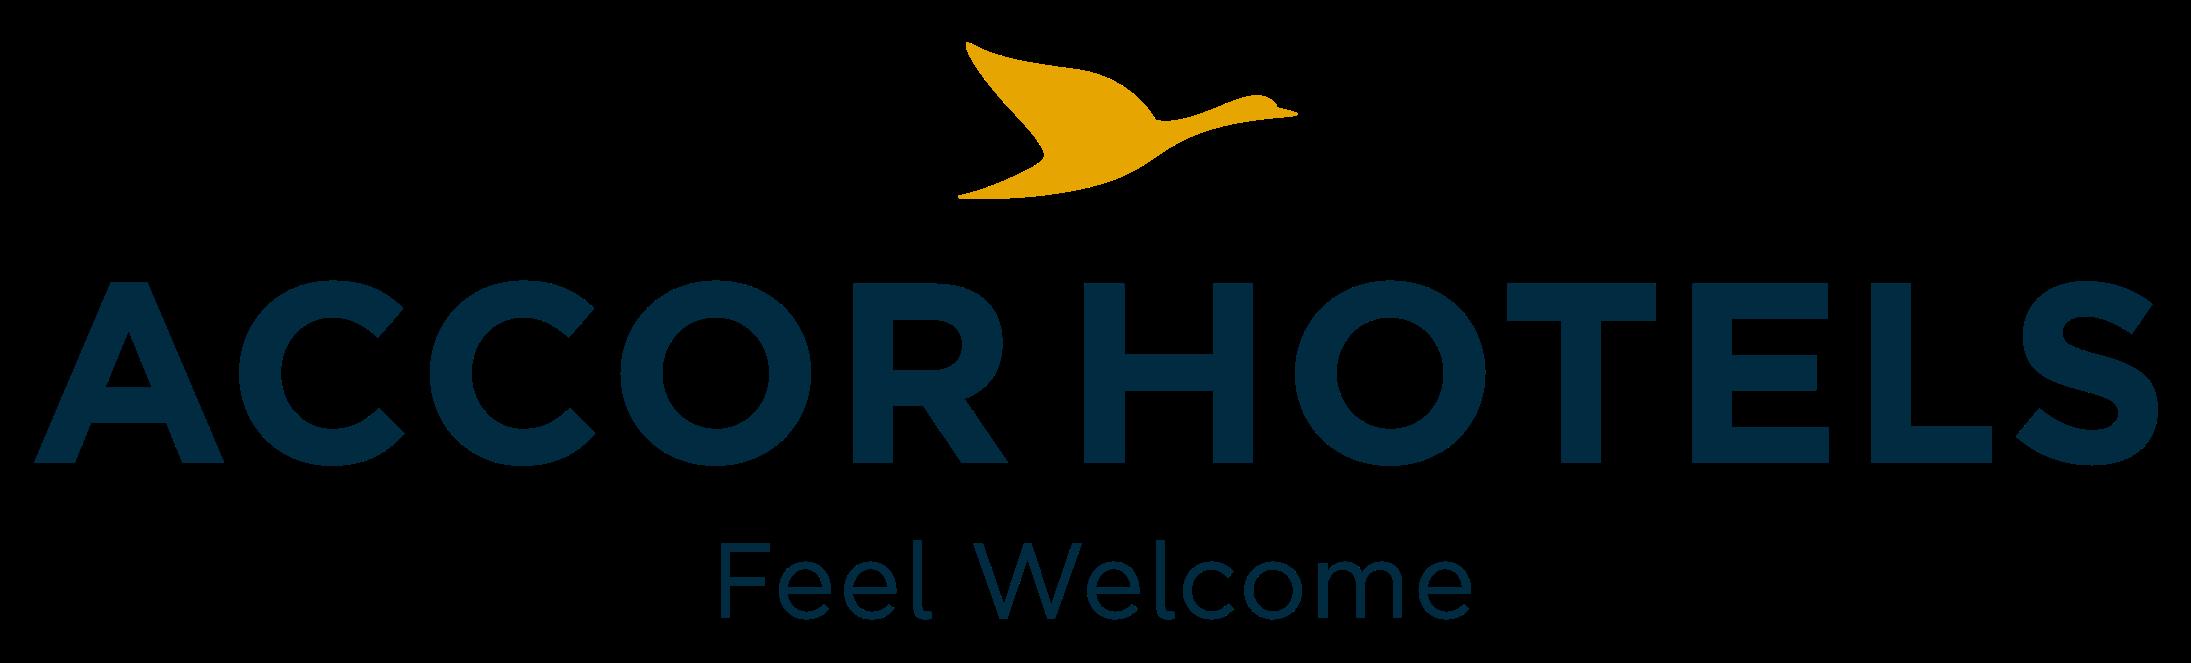 Accor_Hotels_logo